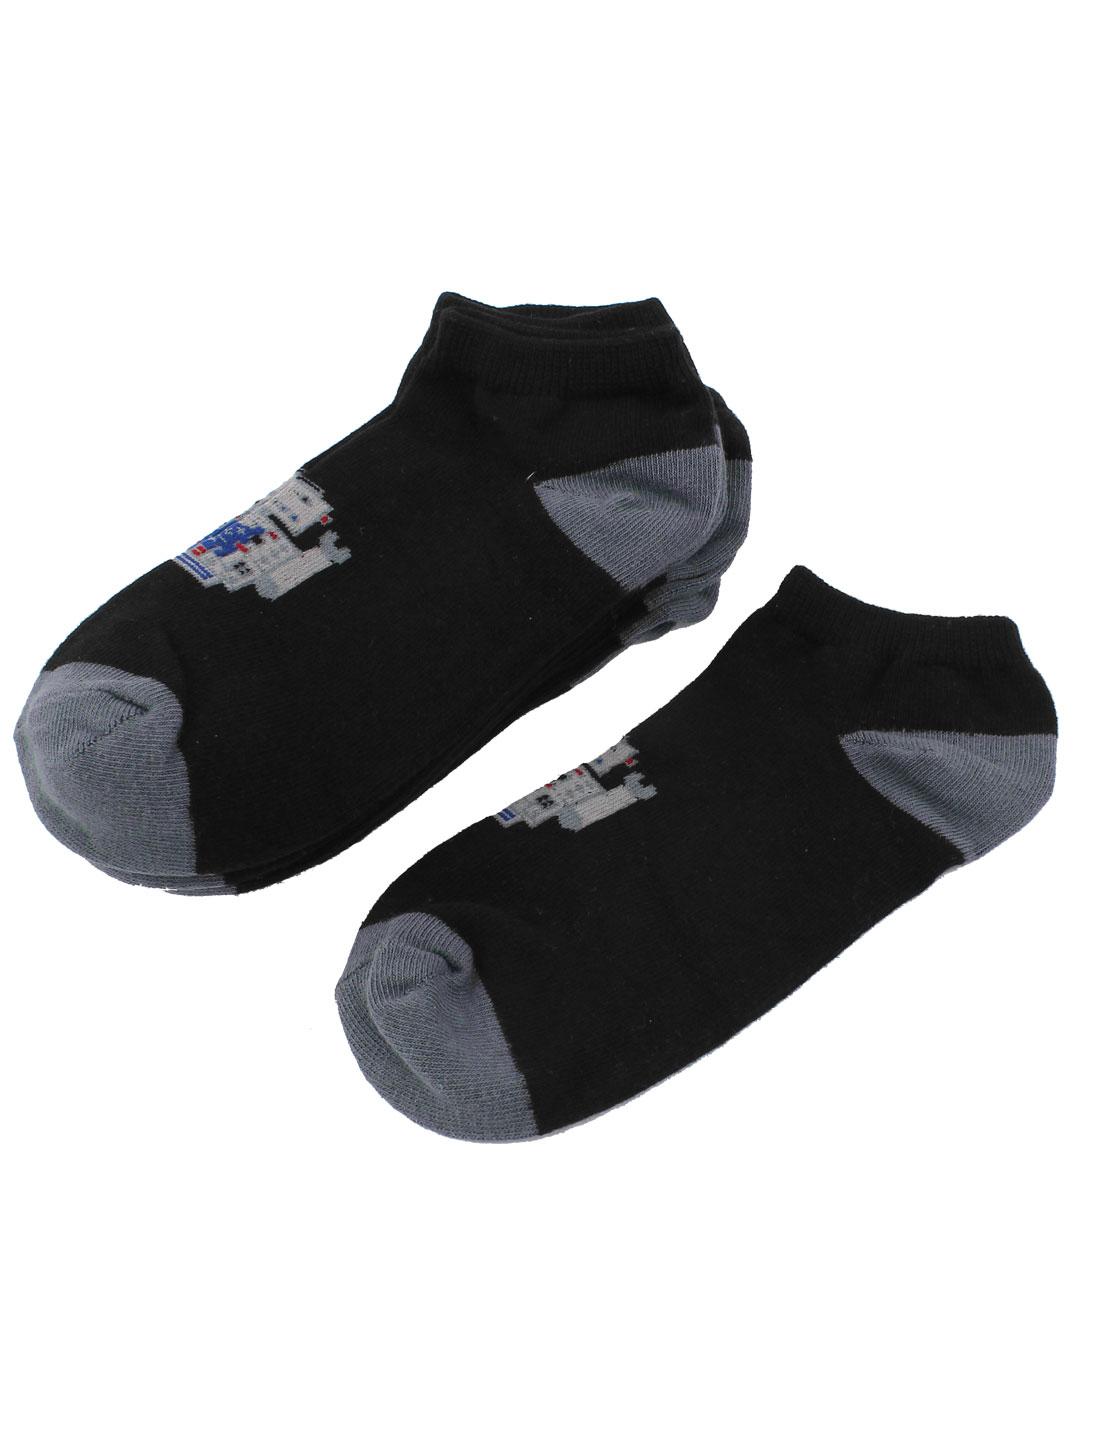 5Pairs Black Cotton Blends Elastic Cuff Short Low Cut Ankle Hosiery Socks Sockens for Boys